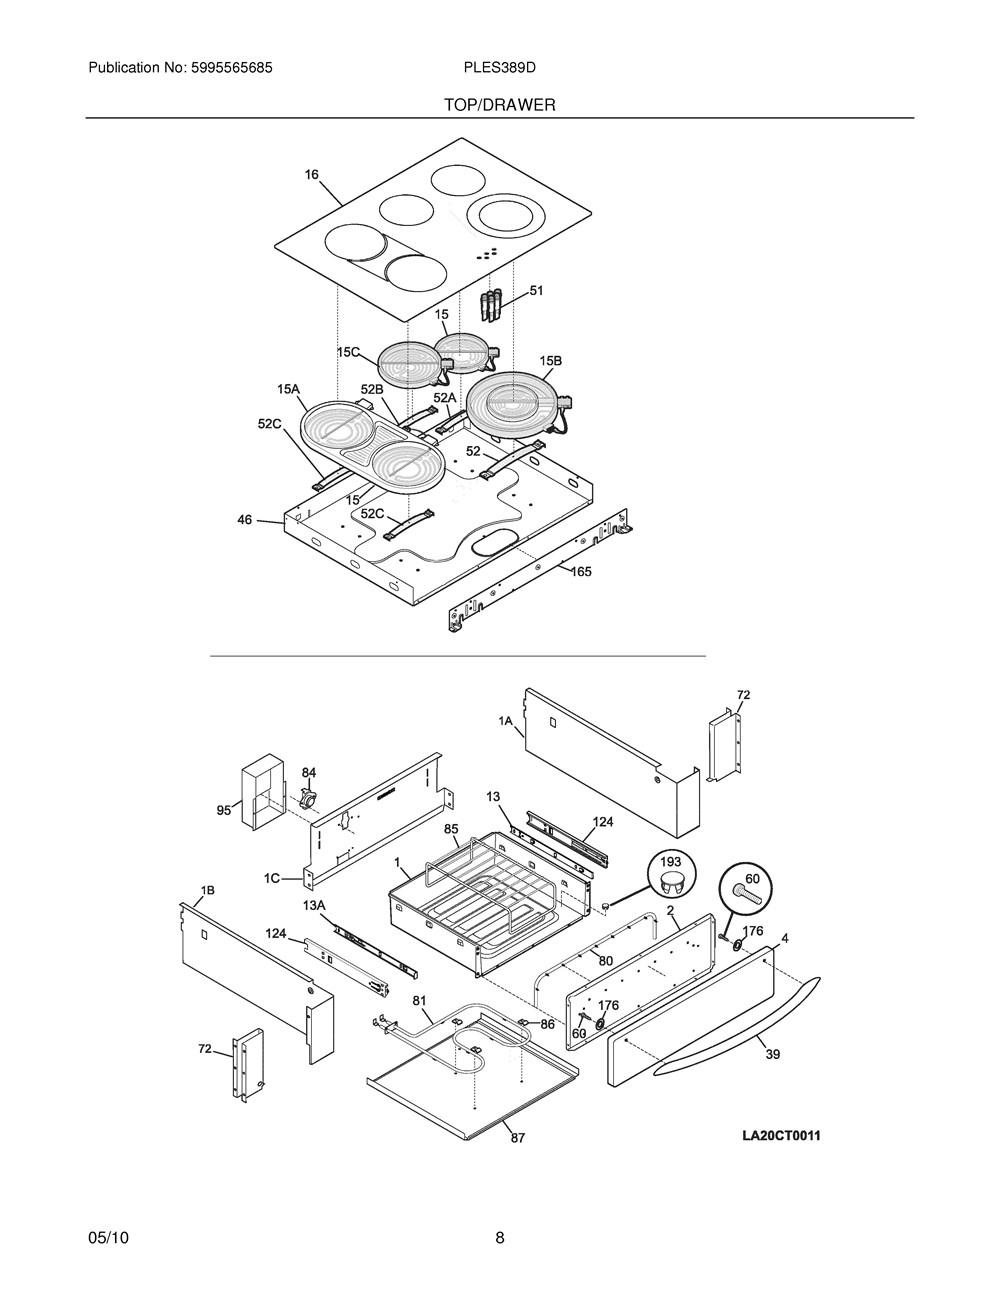 Ples389dcd Frigidaire Company Backguard 05body 07top Drawer 09door 01cover 10wiring Diagram